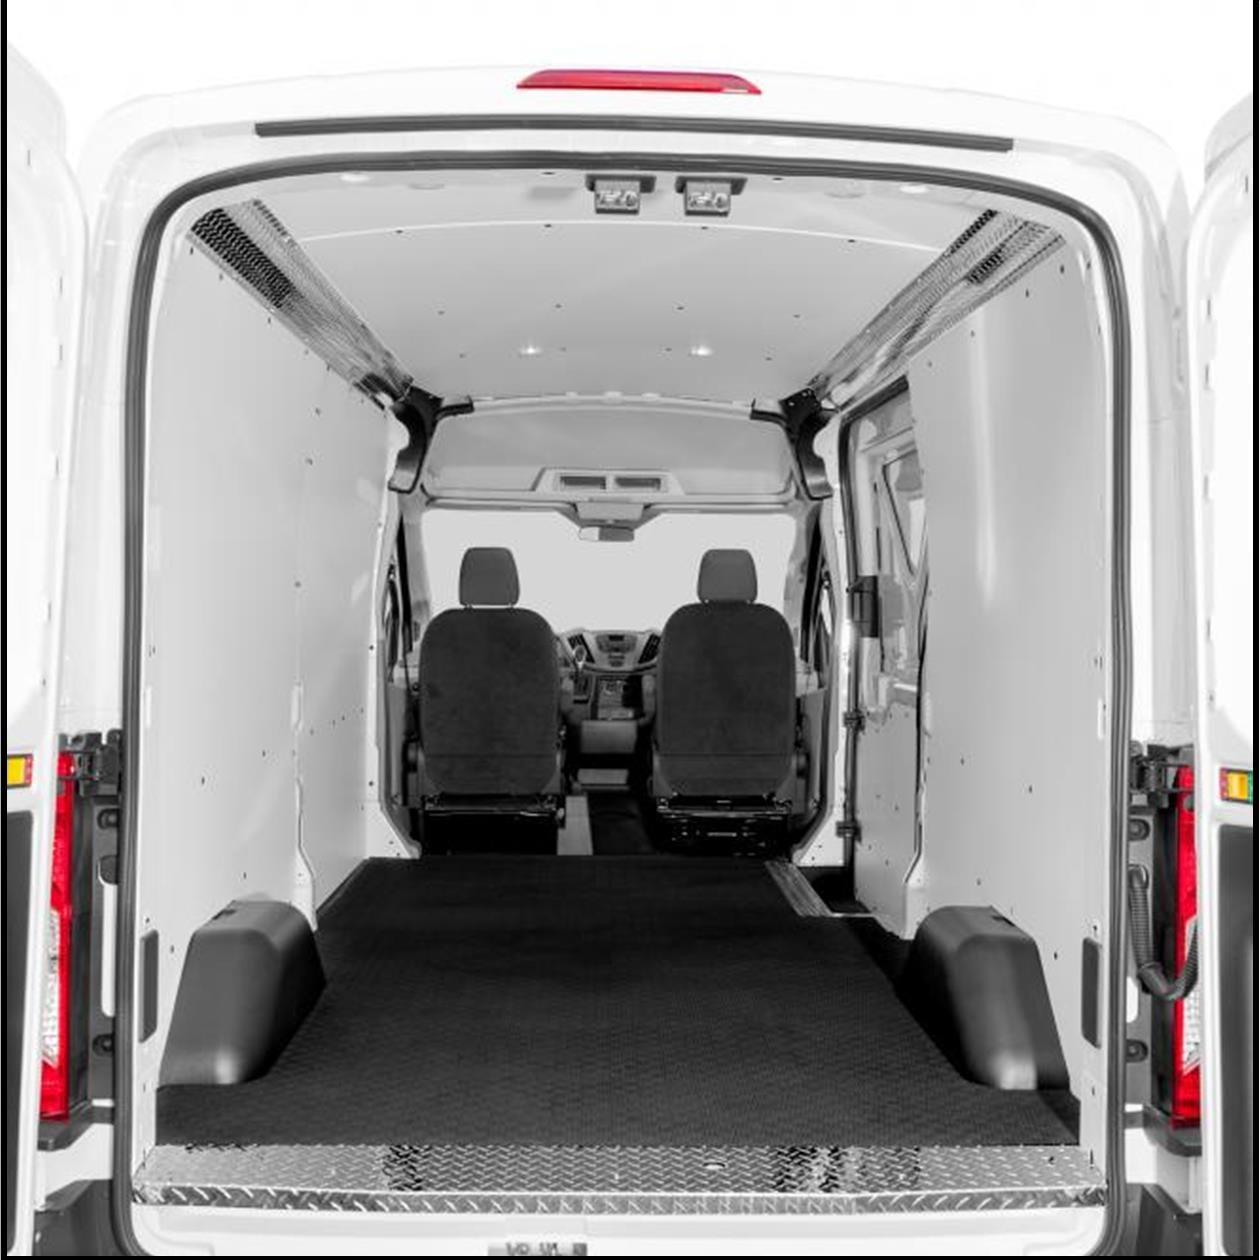 hight resolution of legend fleet solutions automat bar floors for ford transit